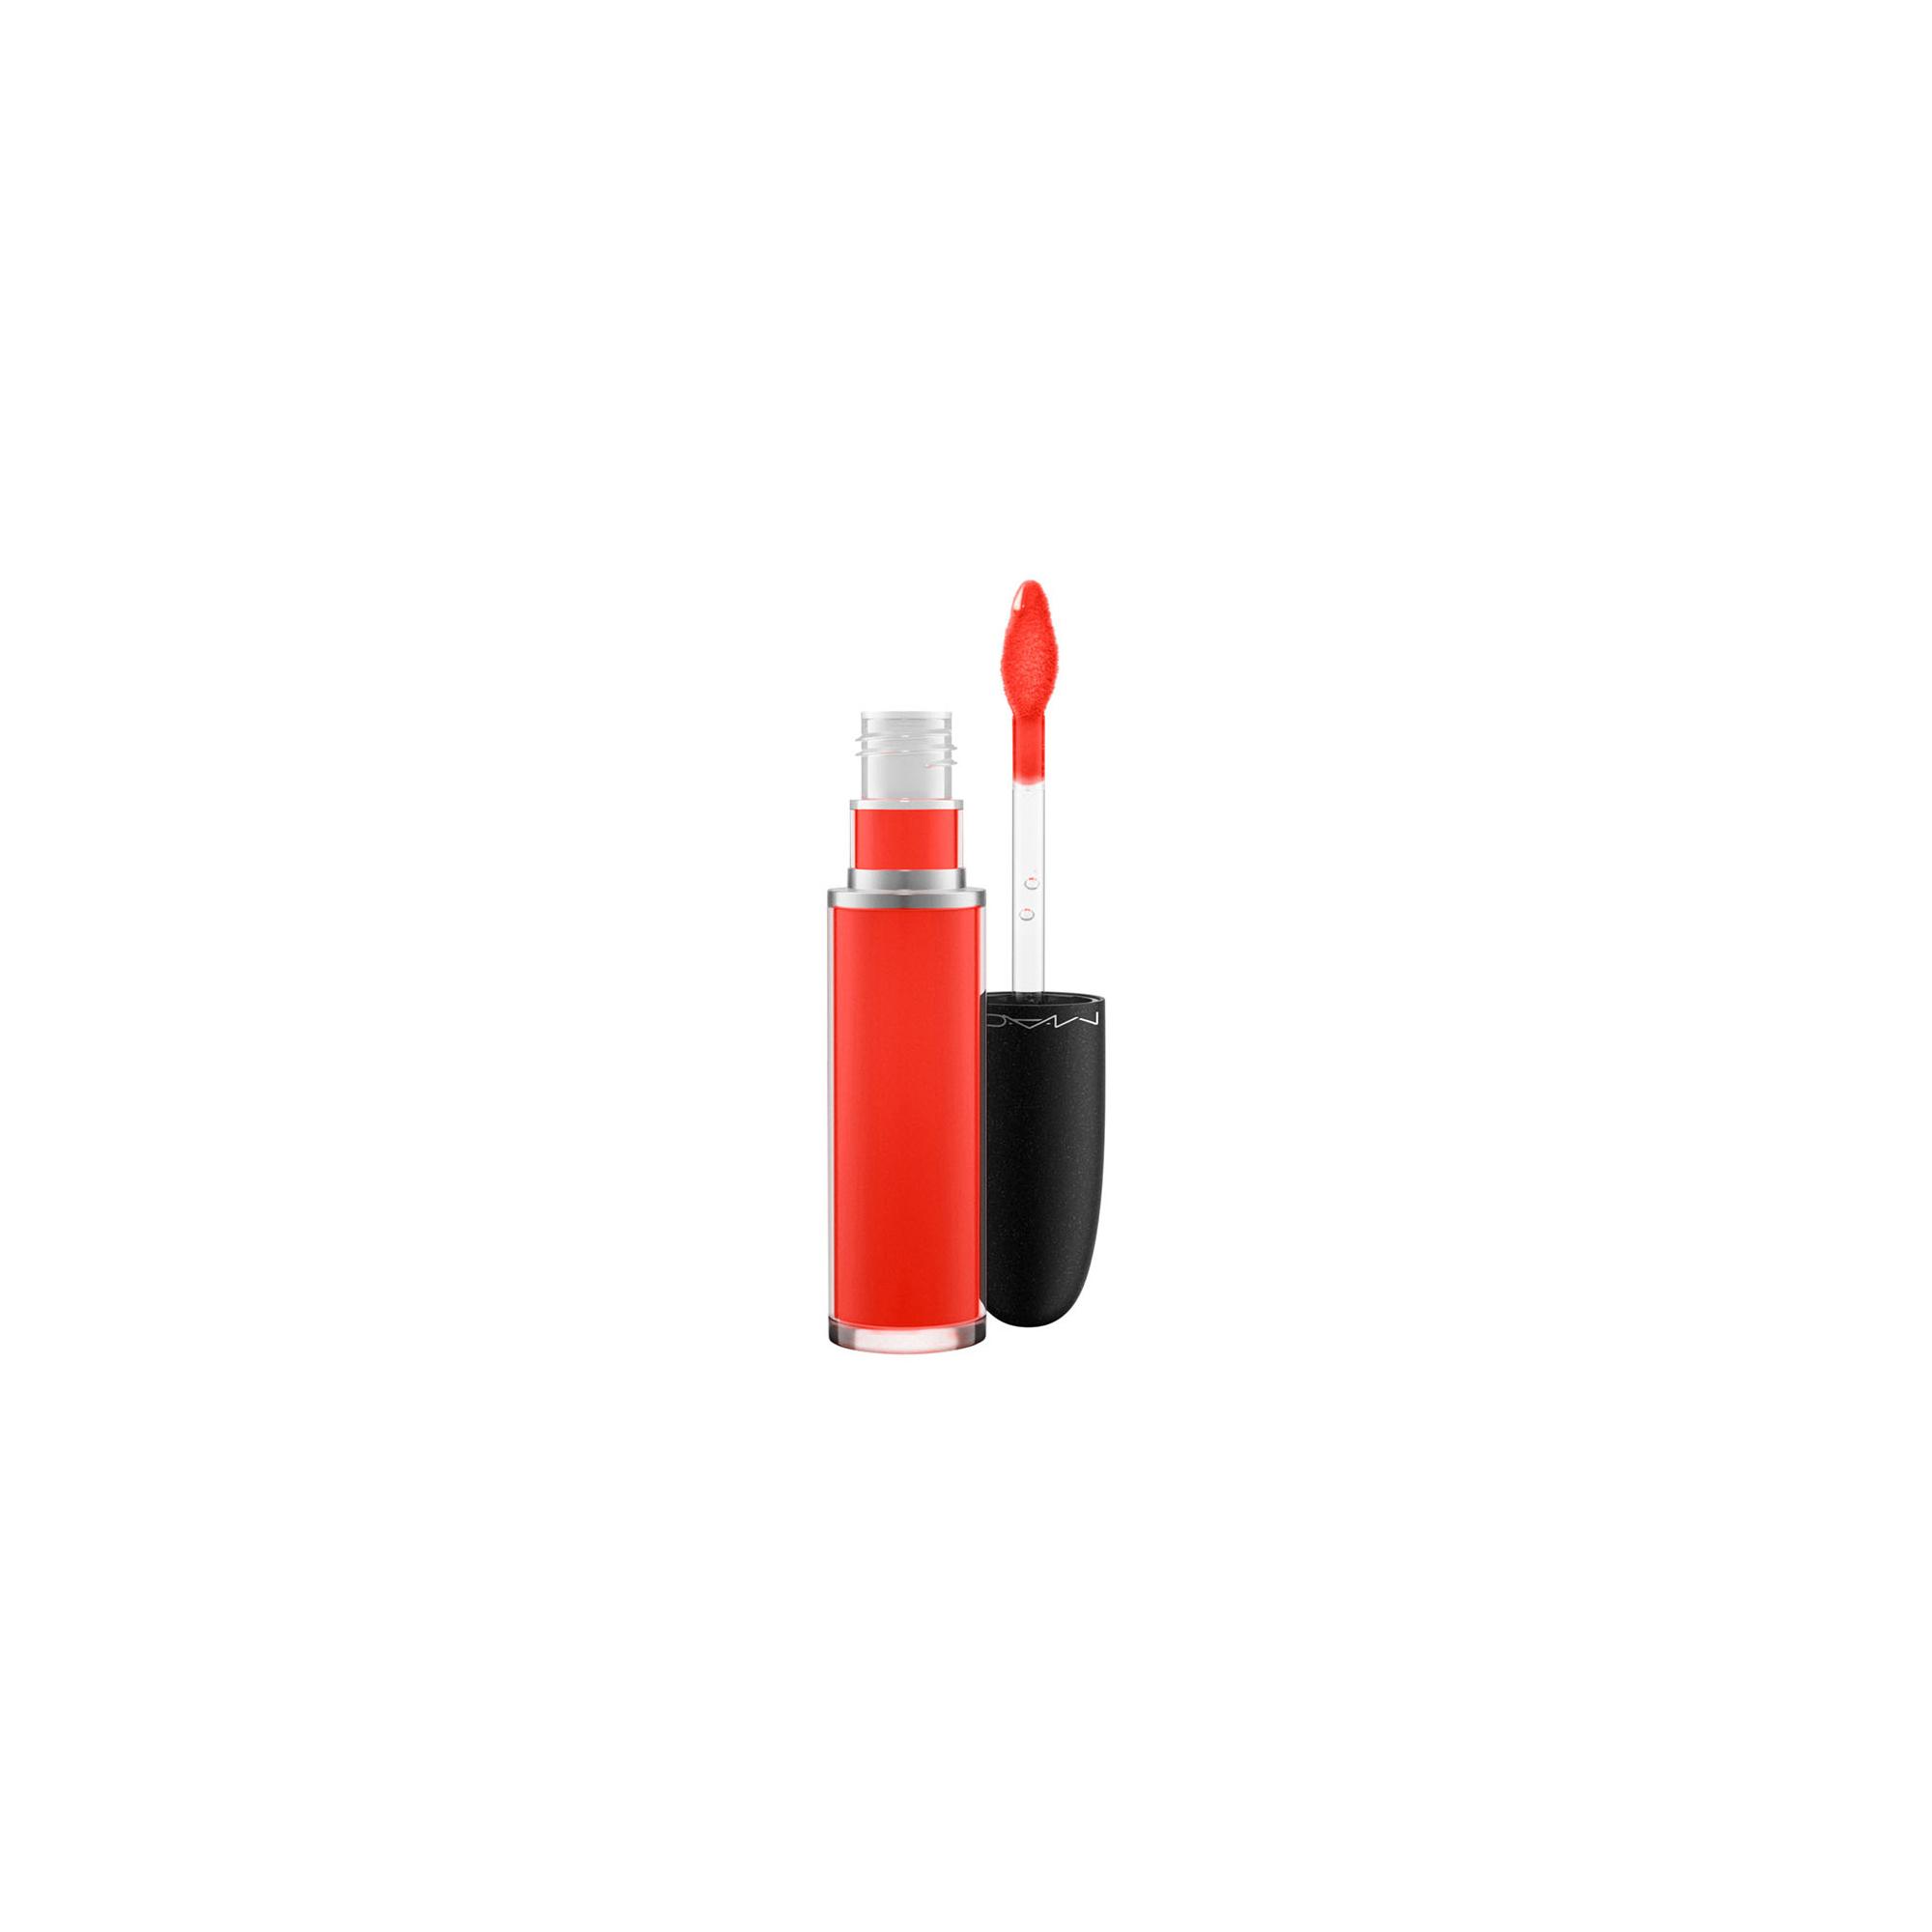 MAC Retro Matte Liquid Lipcolour, quite the standout